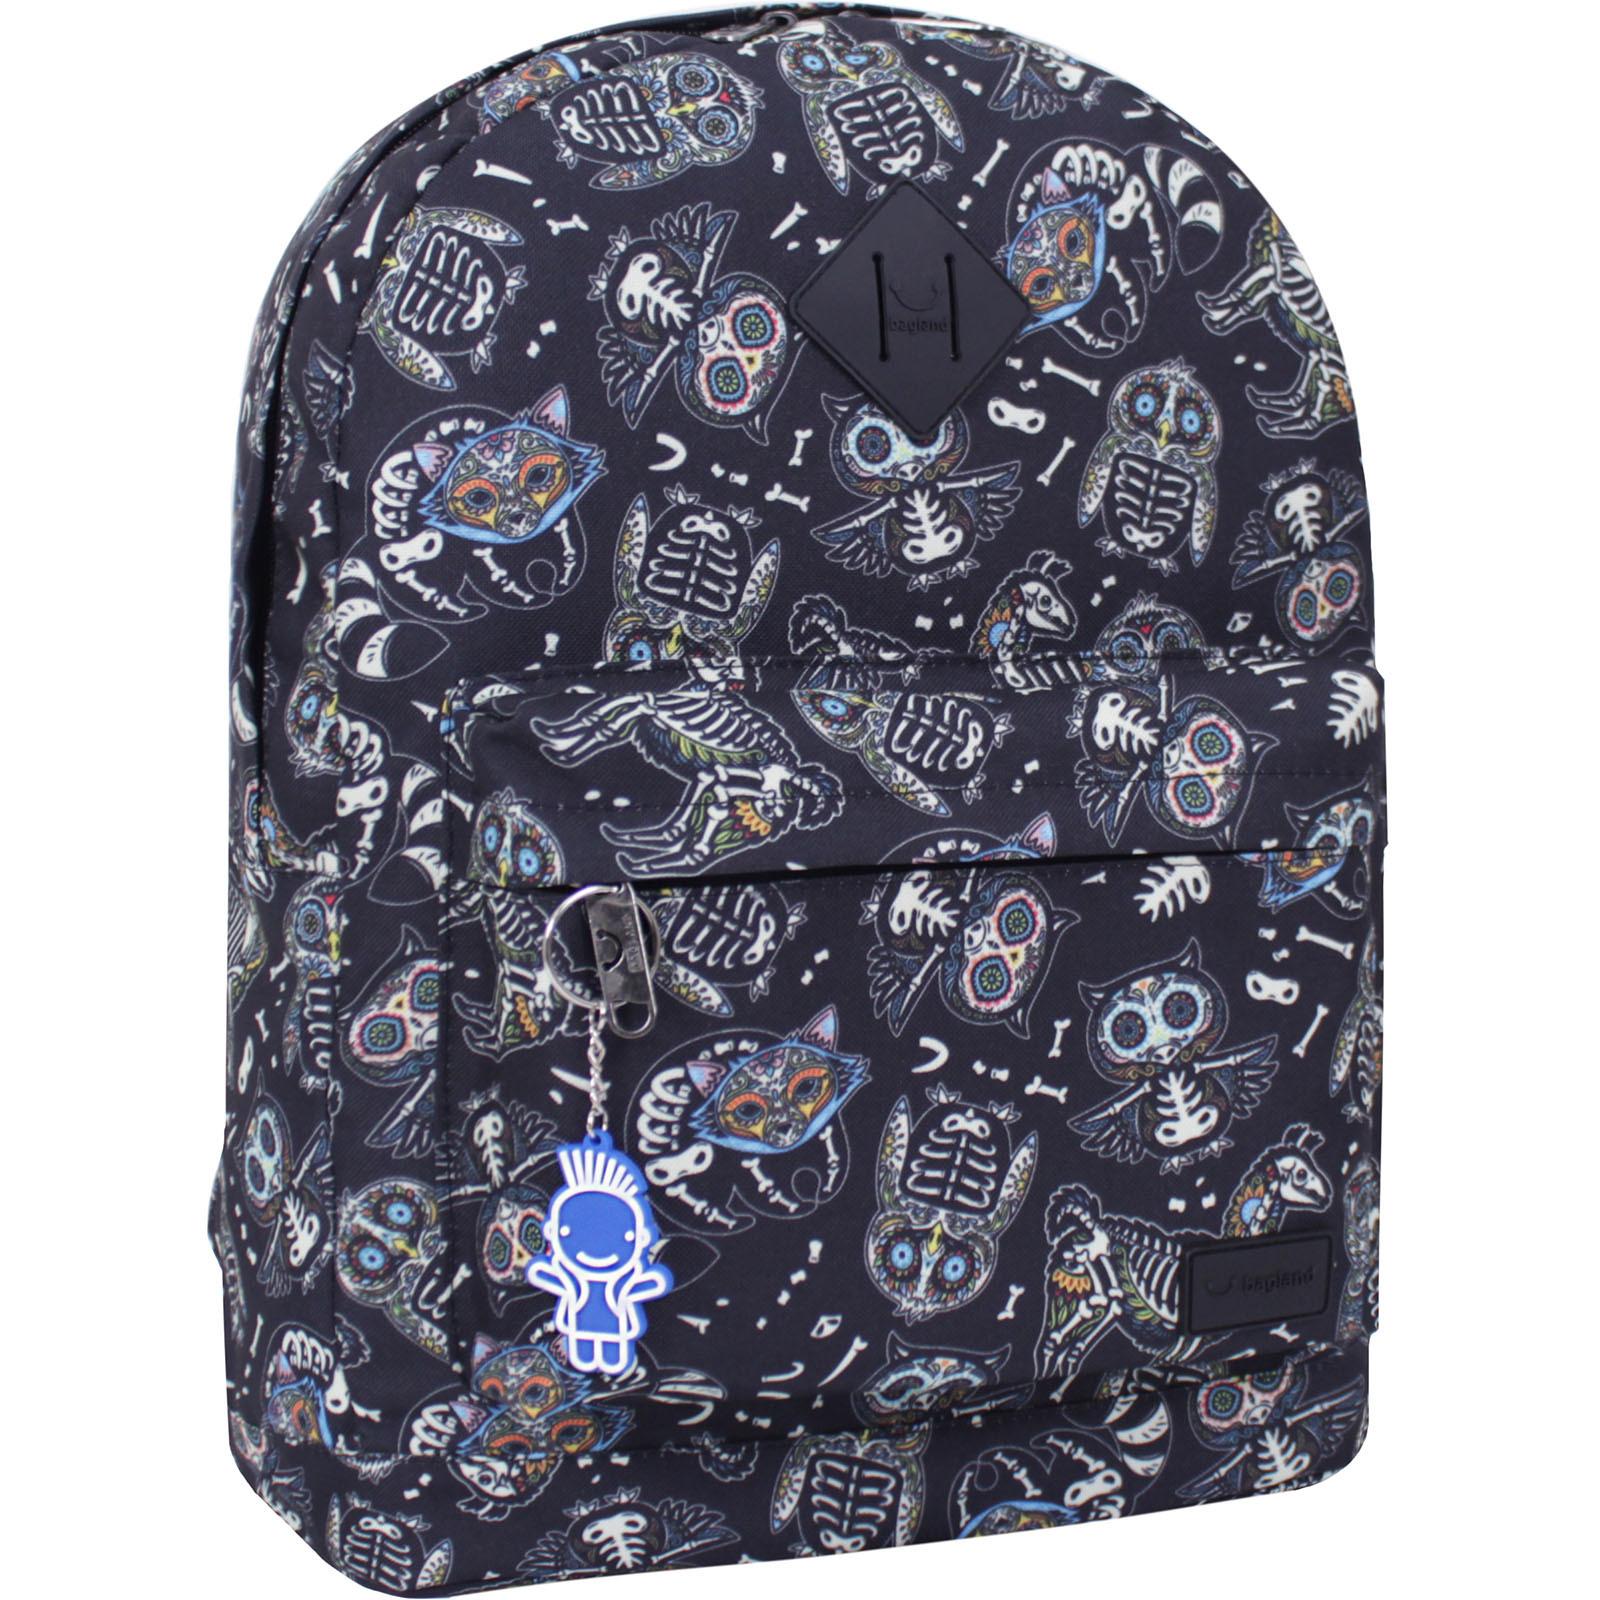 Городские рюкзаки Рюкзак Bagland Молодежный (дизайн) 17 л. сублімація 474 (00533664) IMG_3584_суб.474_.JPG